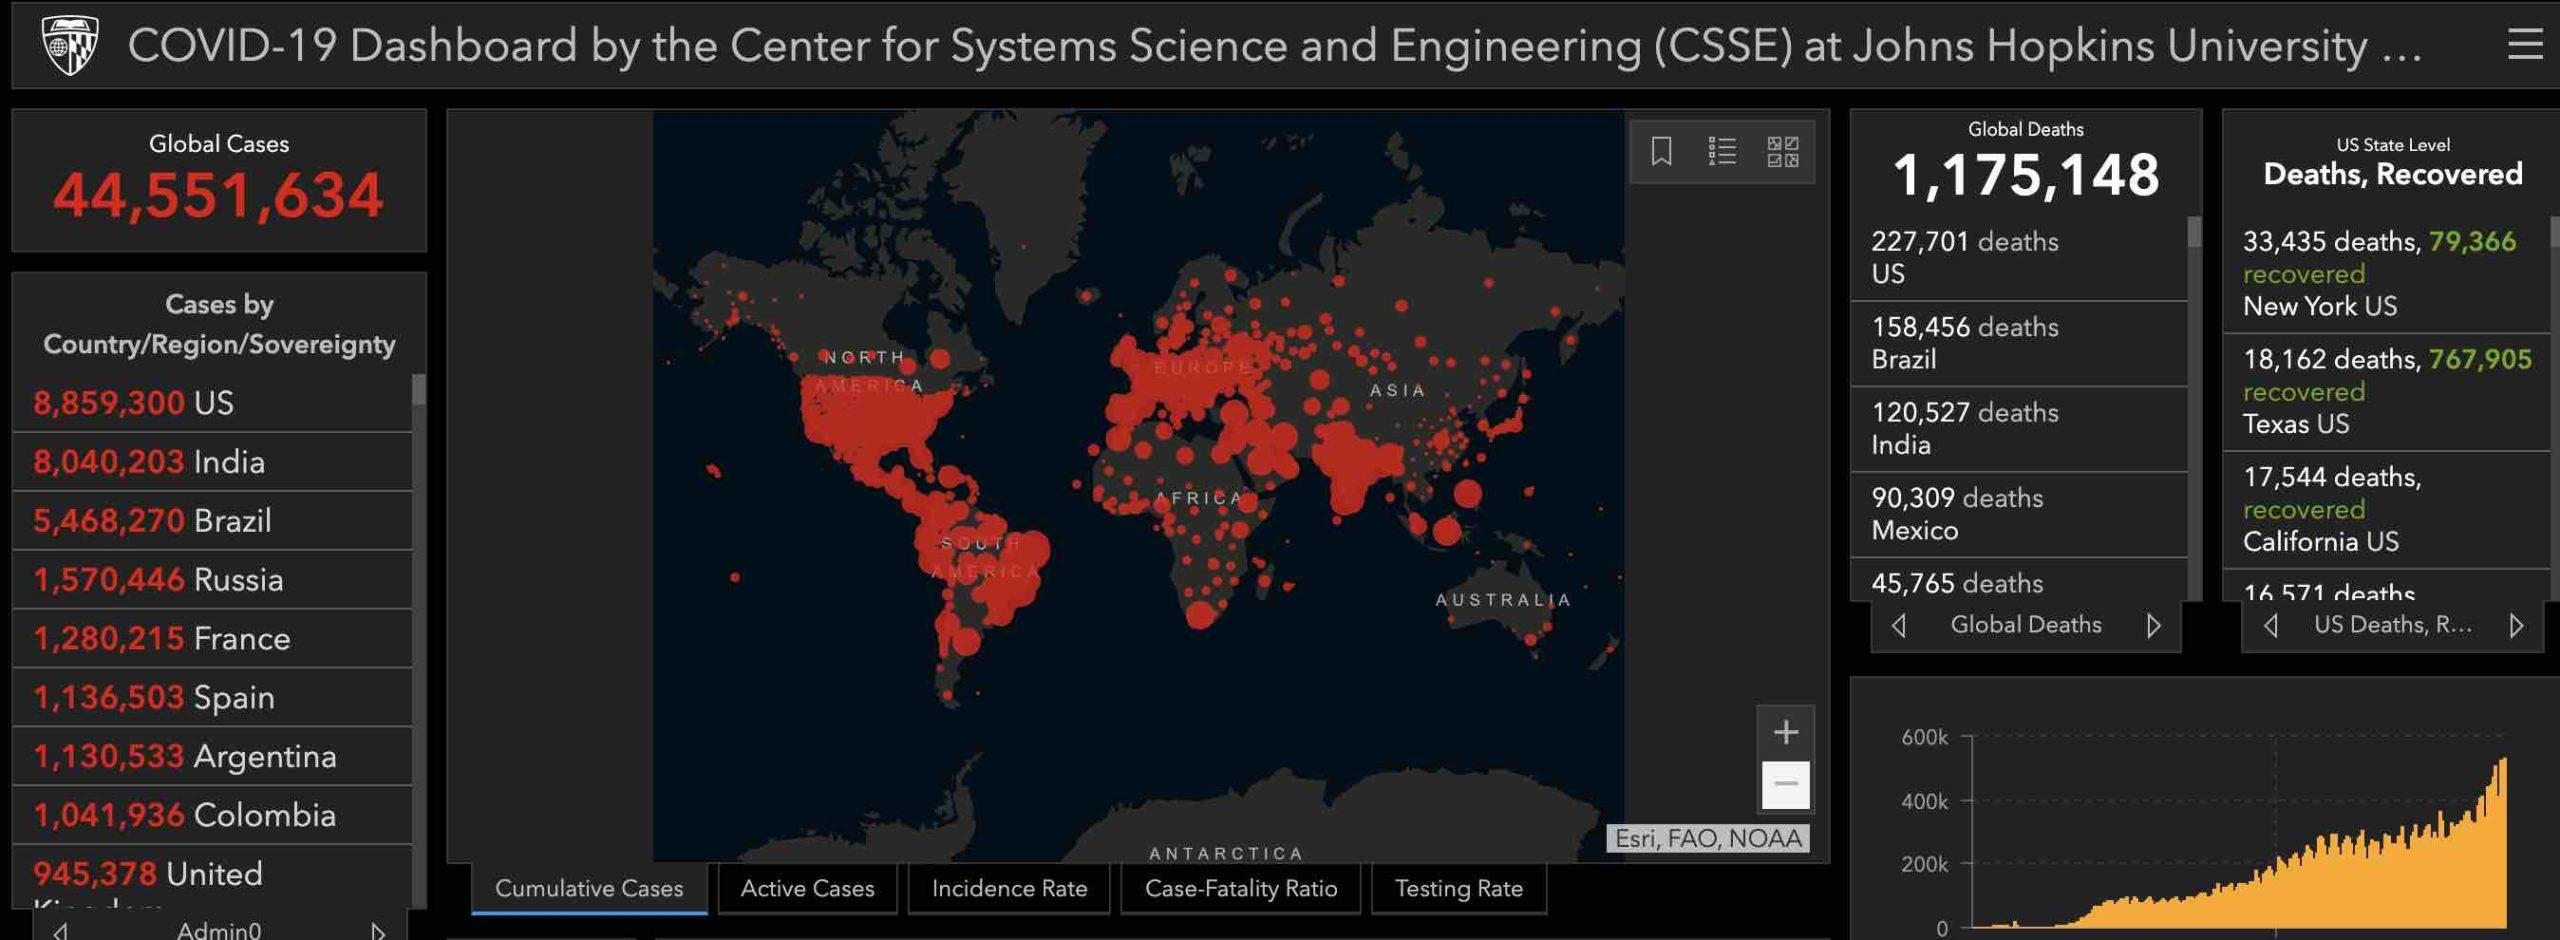 Johns Hopkins University COVID19 screentracker on October 29 2020